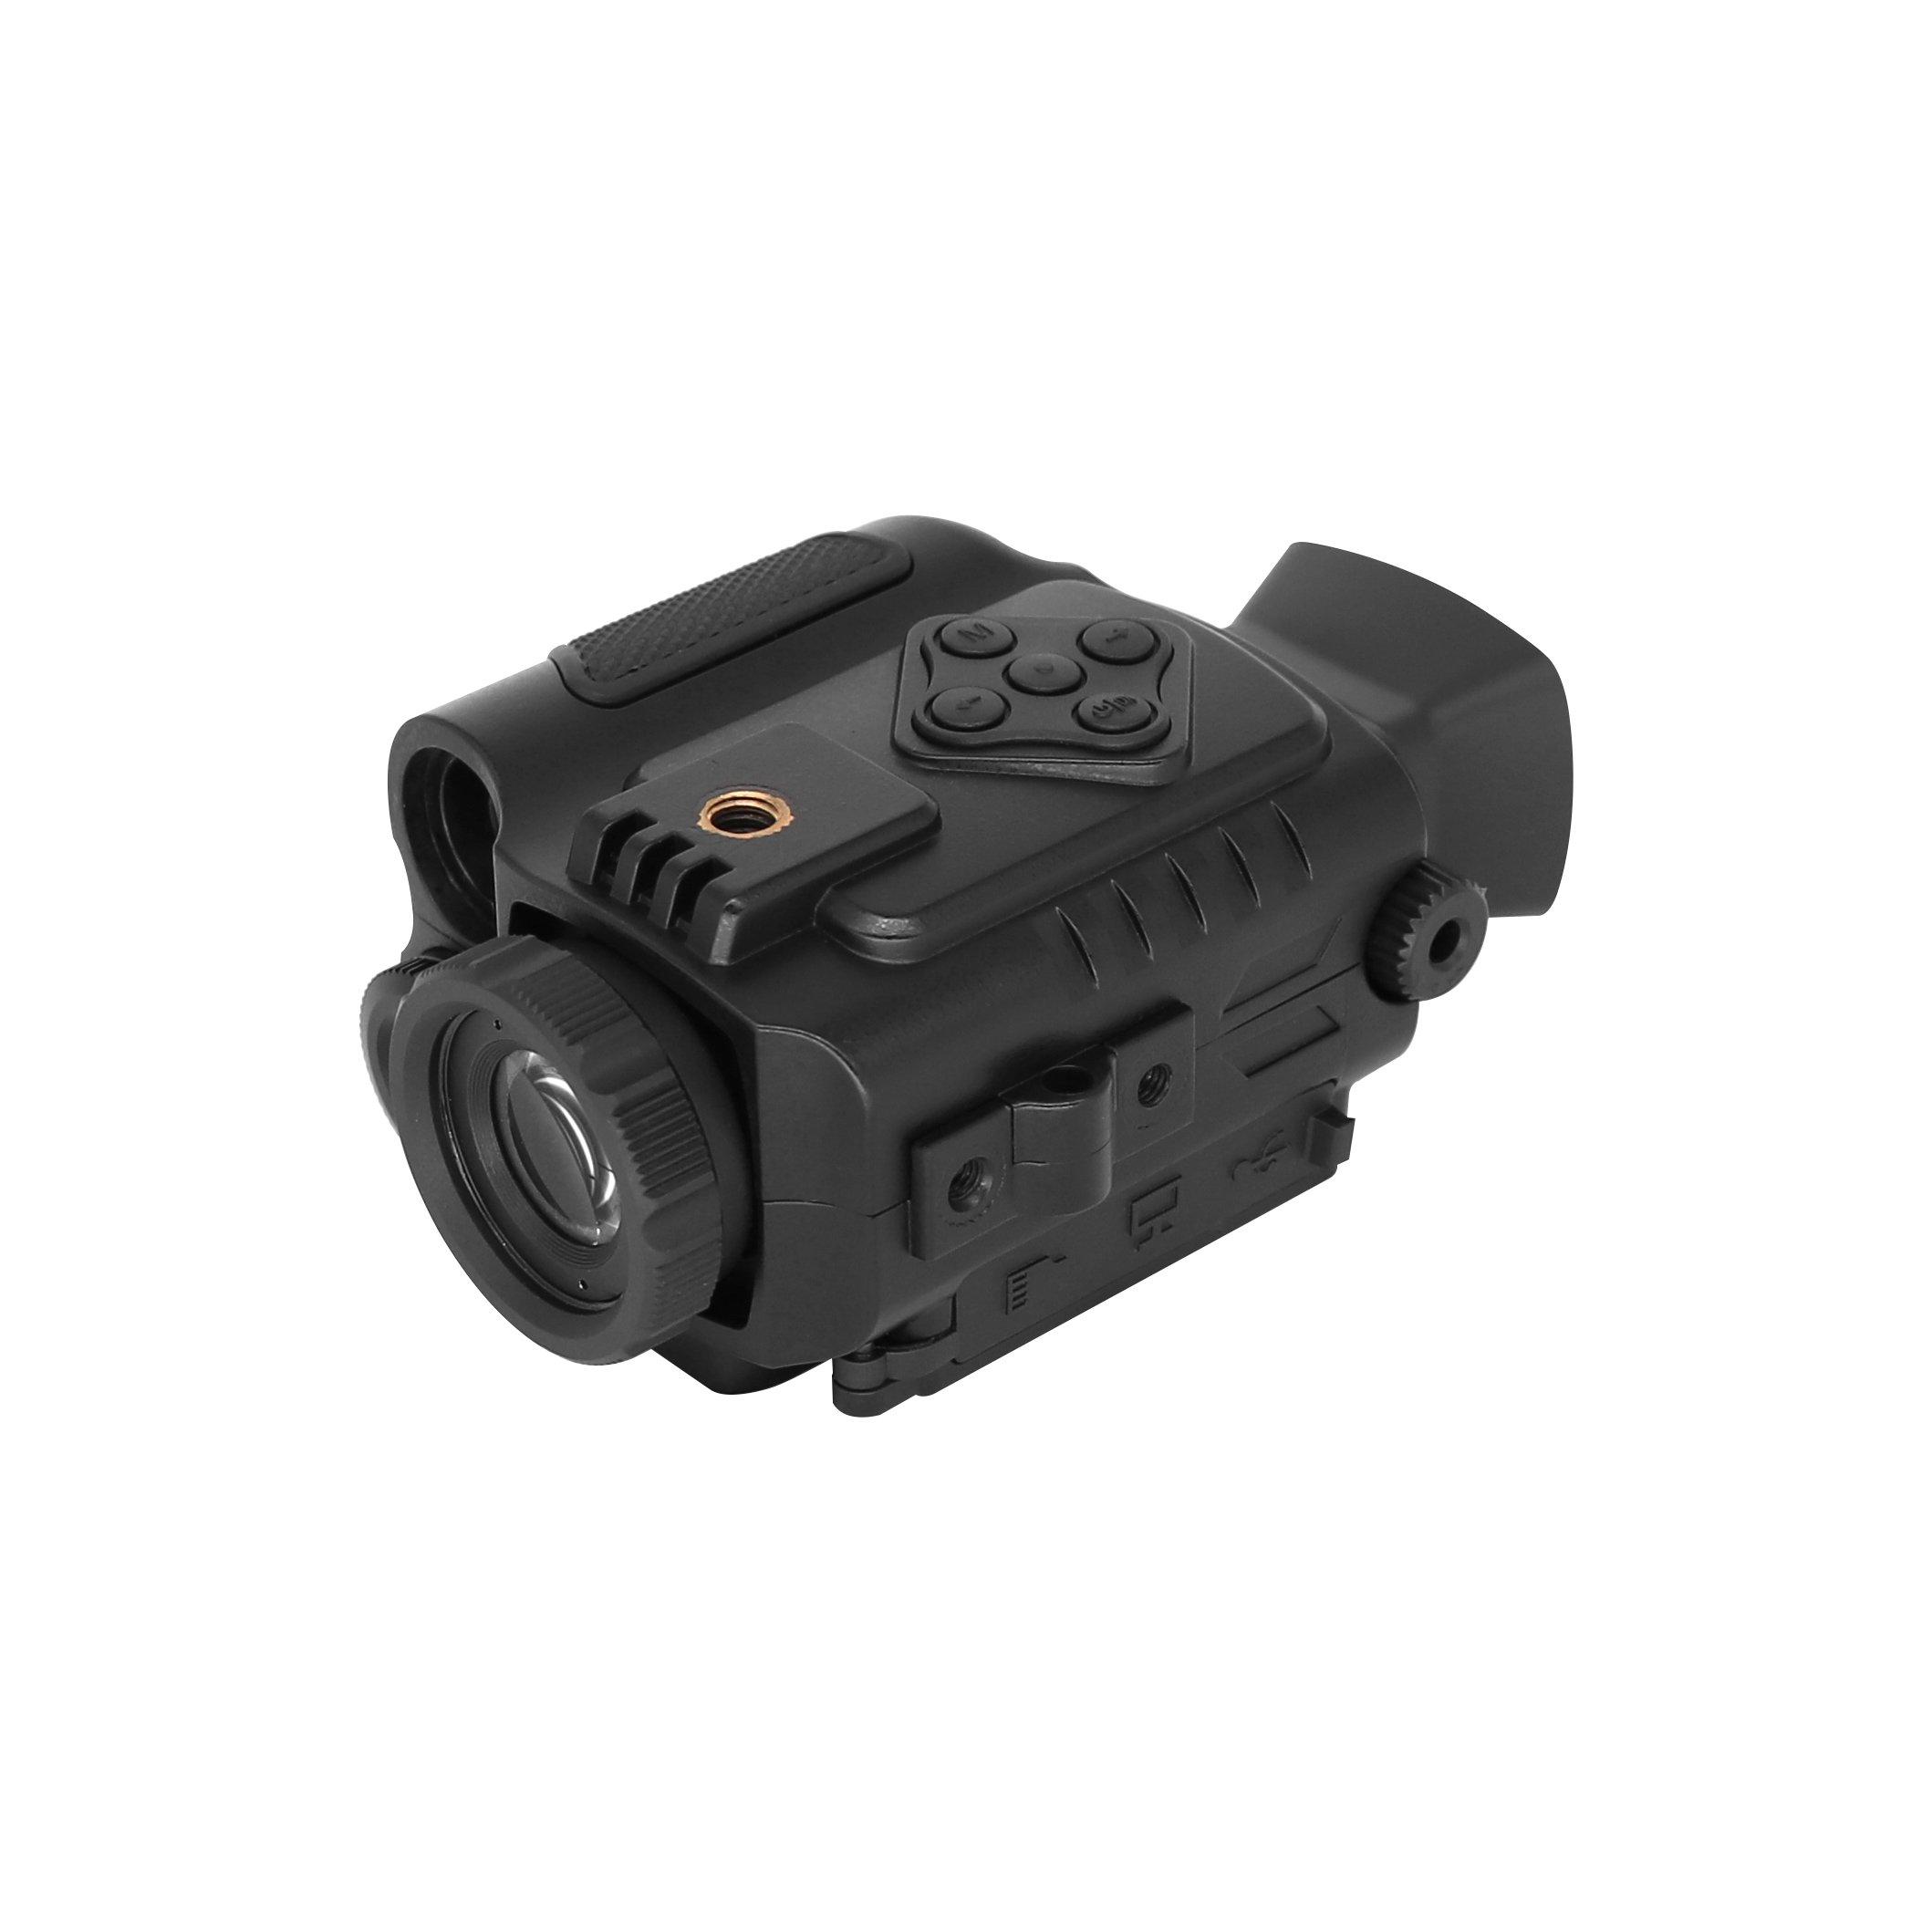 Bestguarder NV-600 Ultra Small 1-5X18mm Digital Infrared Night Vision Multi-Purpose Monocular/Scope, Black by Bestguarder